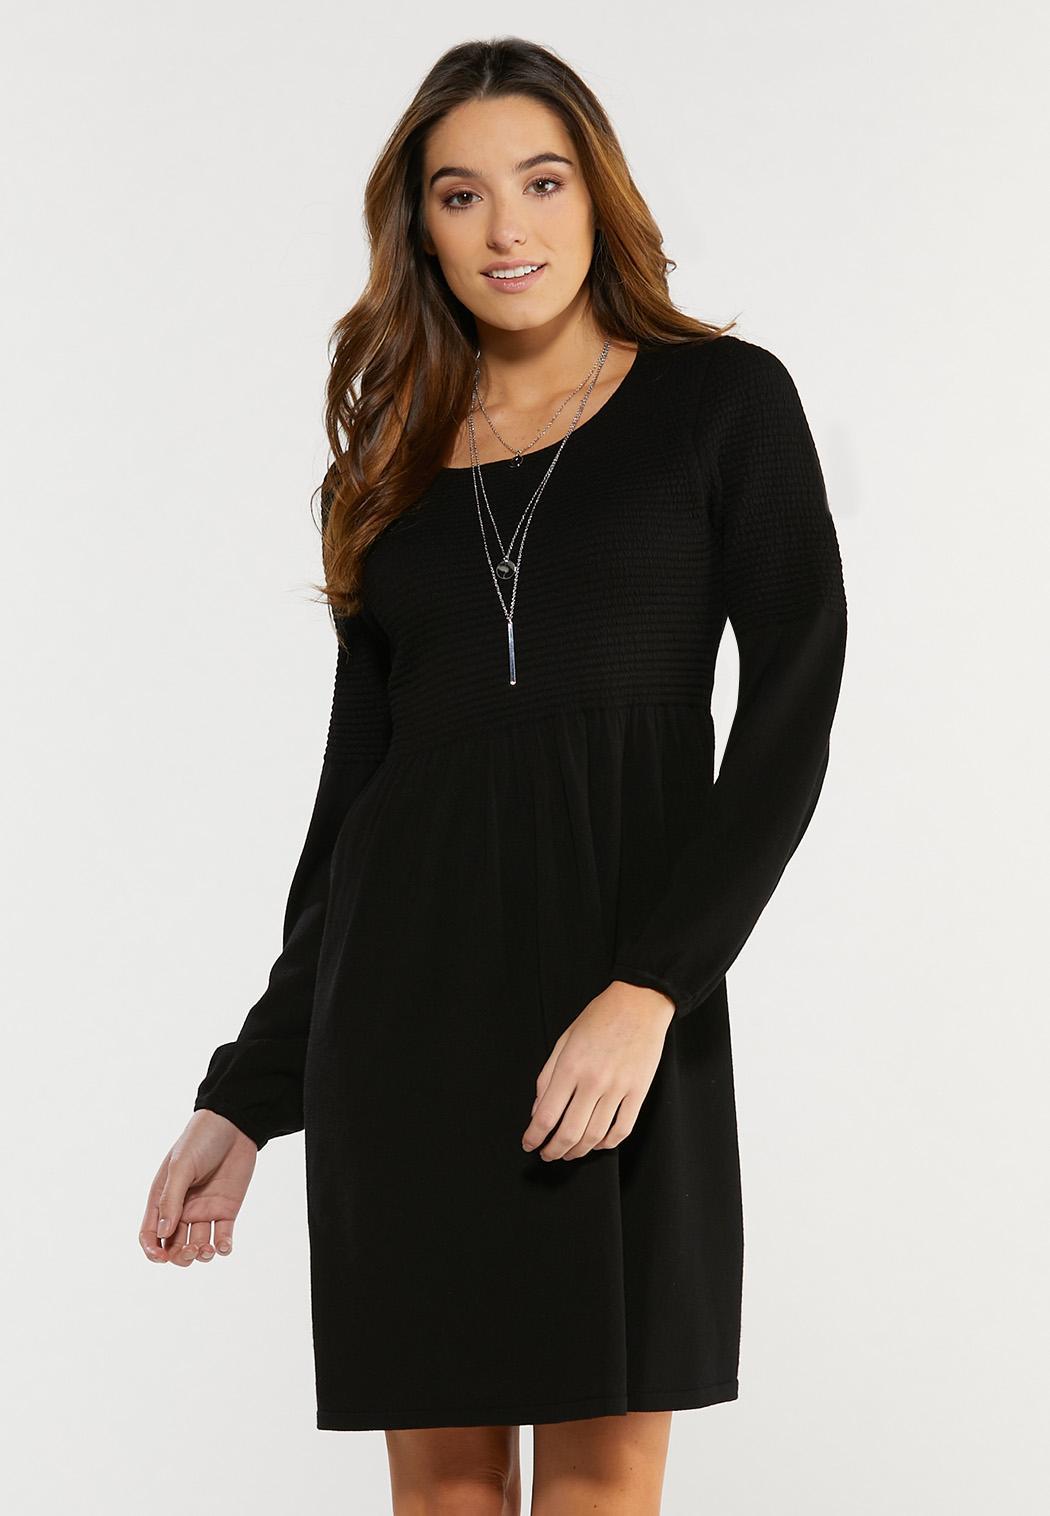 Plus Size Textured Black Babydoll Dress